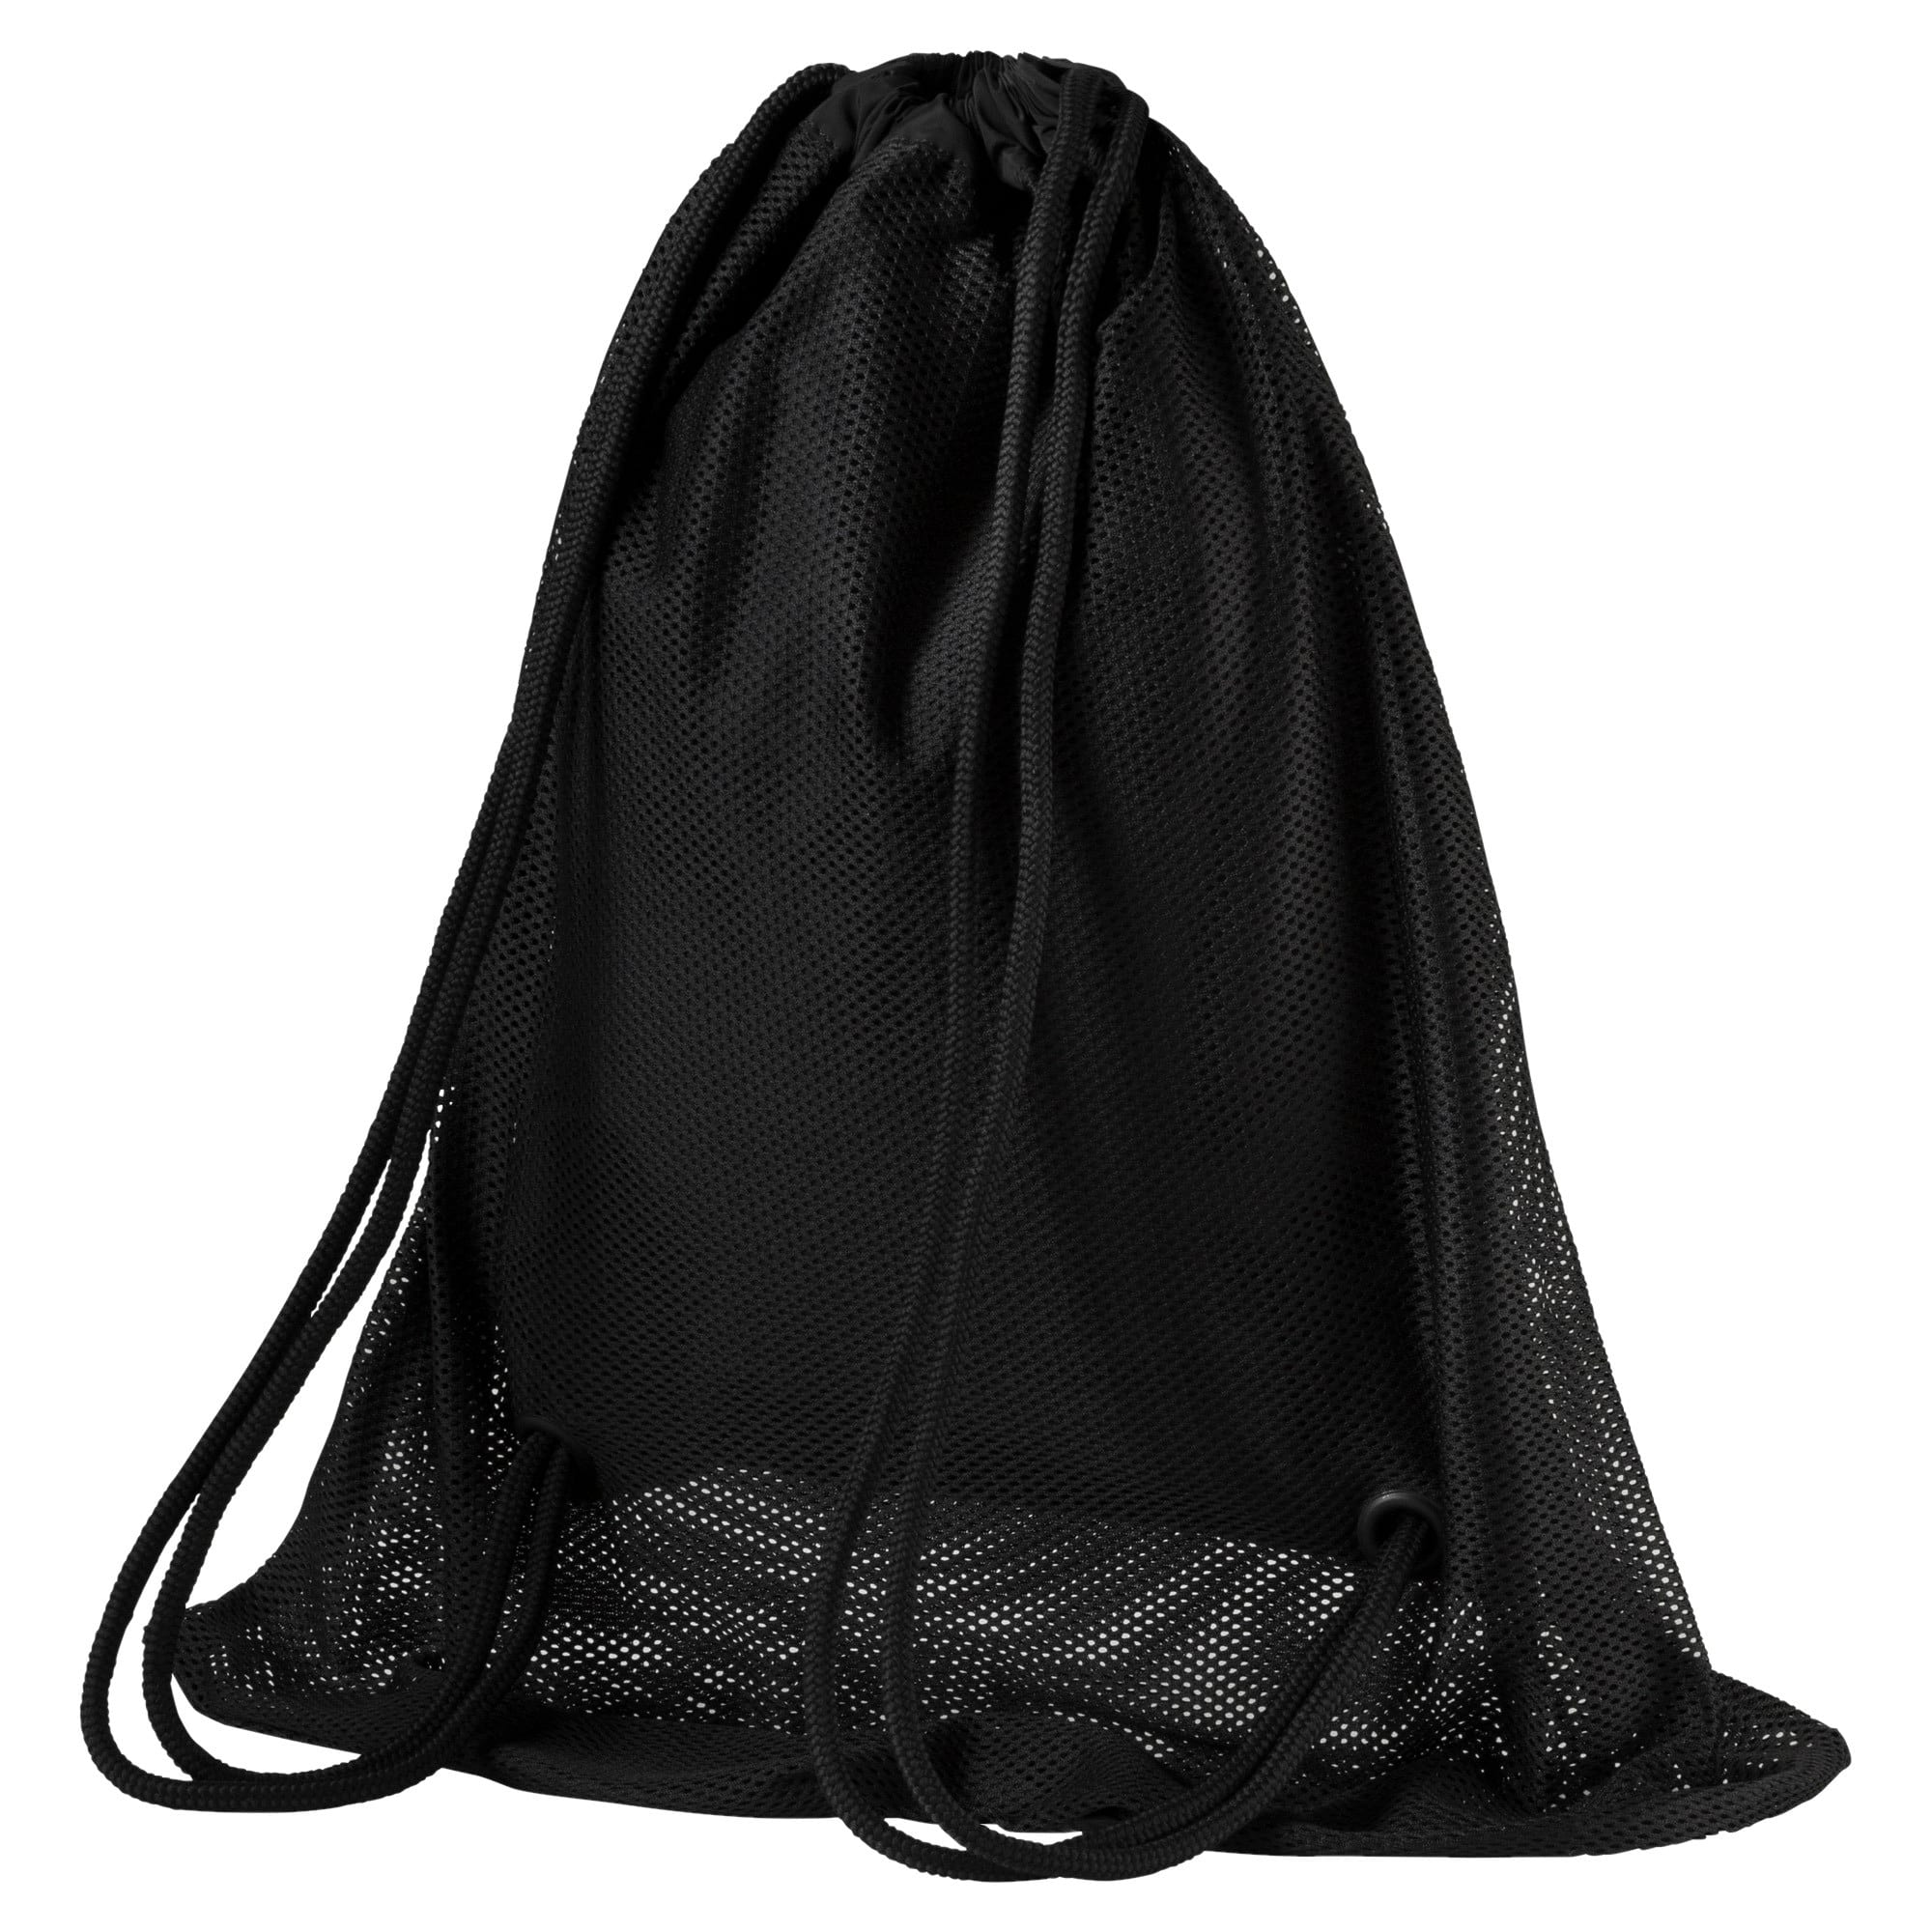 Thumbnail 2 of Archive Women's Prime X-treme Gym Bag, Puma Black, medium-IND